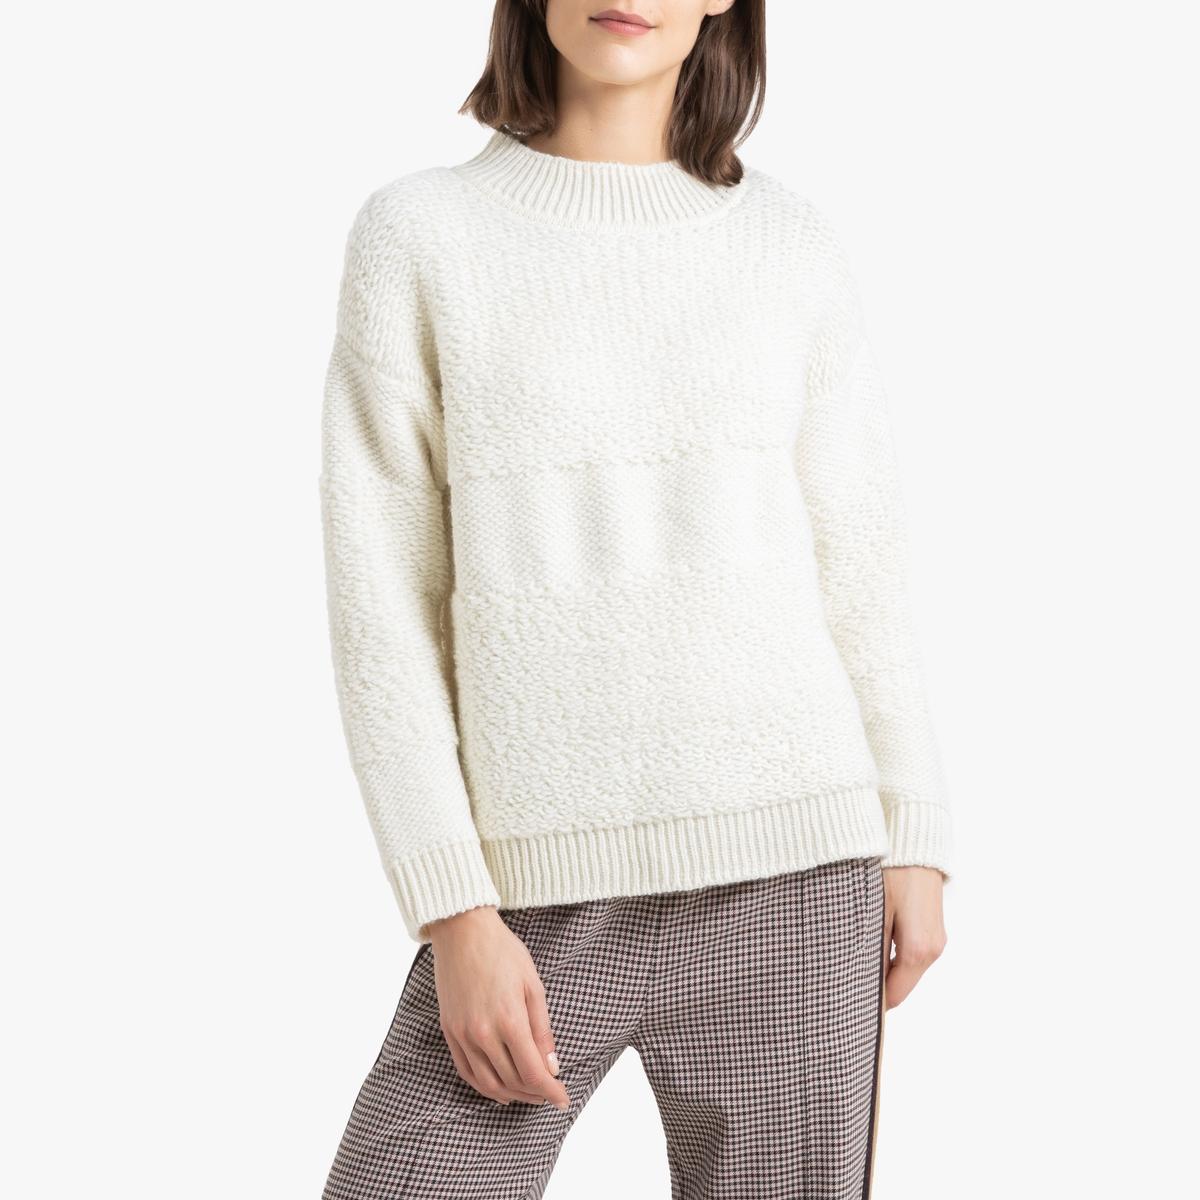 Пуловер La Redoute С круглым вырезом из тонкого трикотажа PAYTON 0(XS) бежевый цена